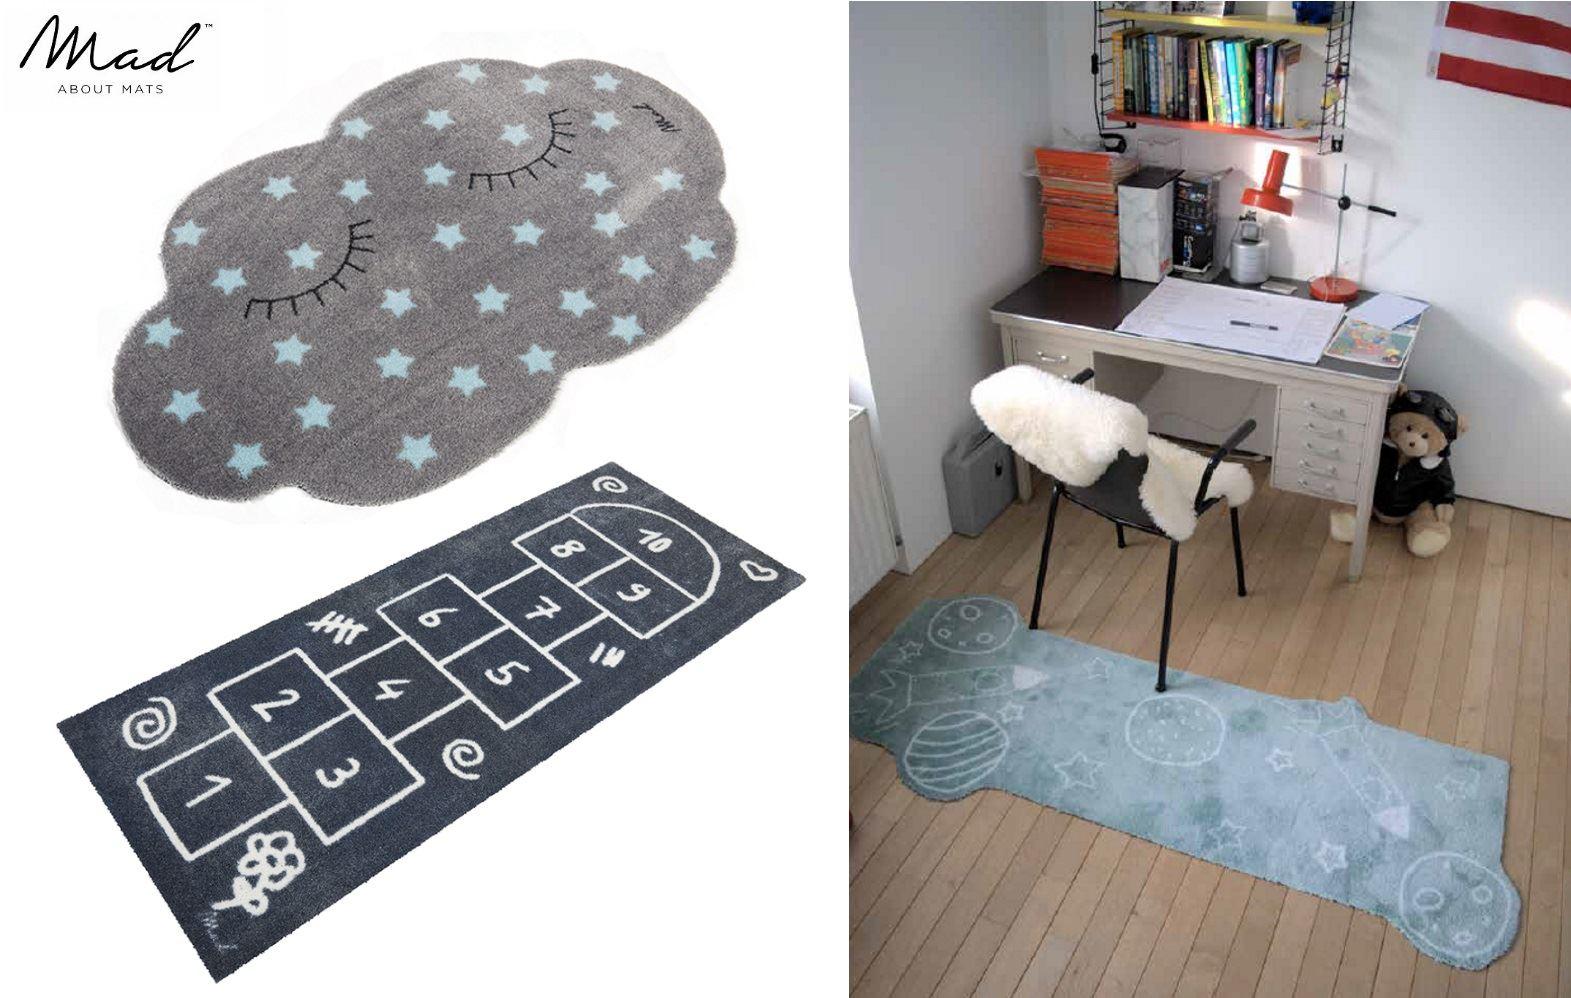 mad about mats children kids floor play mat rug in cloud. Black Bedroom Furniture Sets. Home Design Ideas